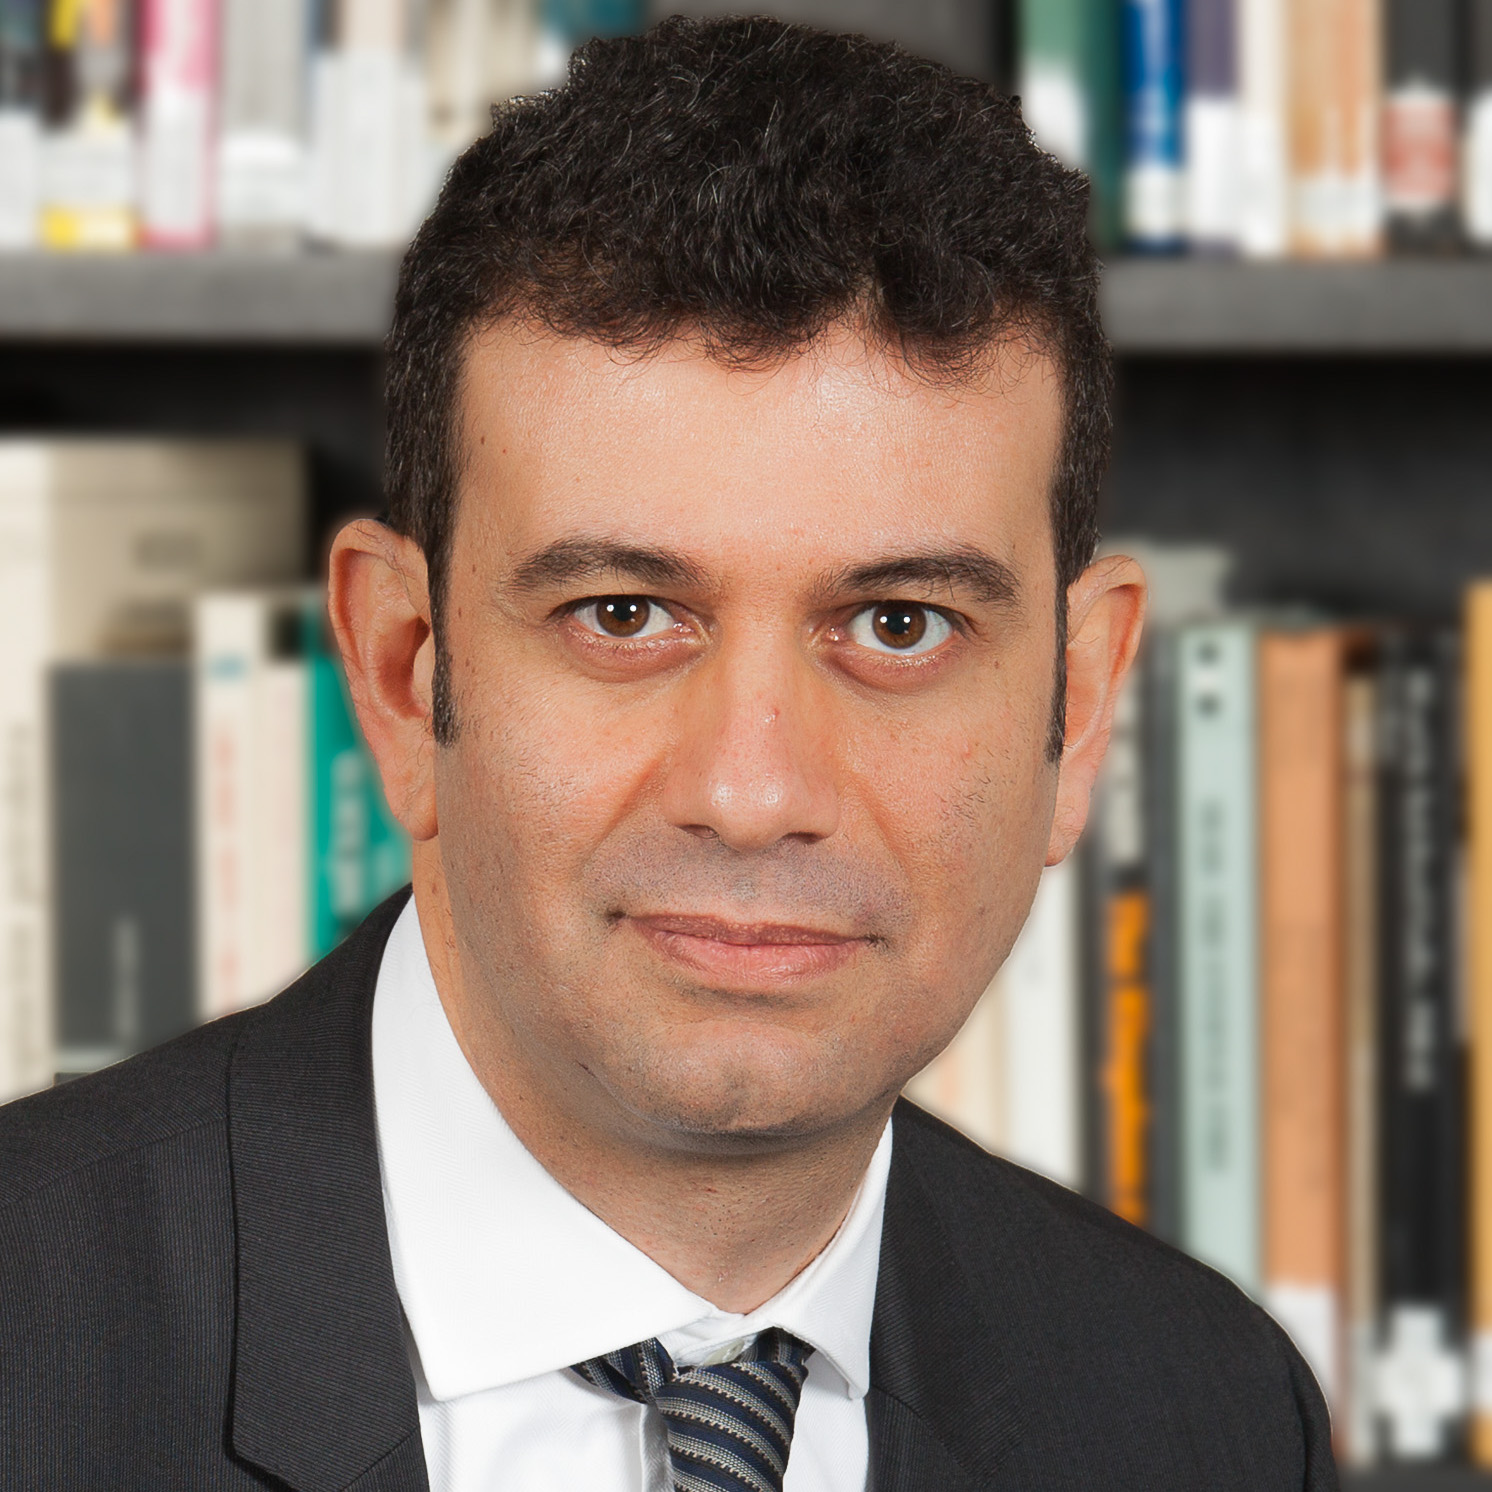 Dr. Bassam Fattouh